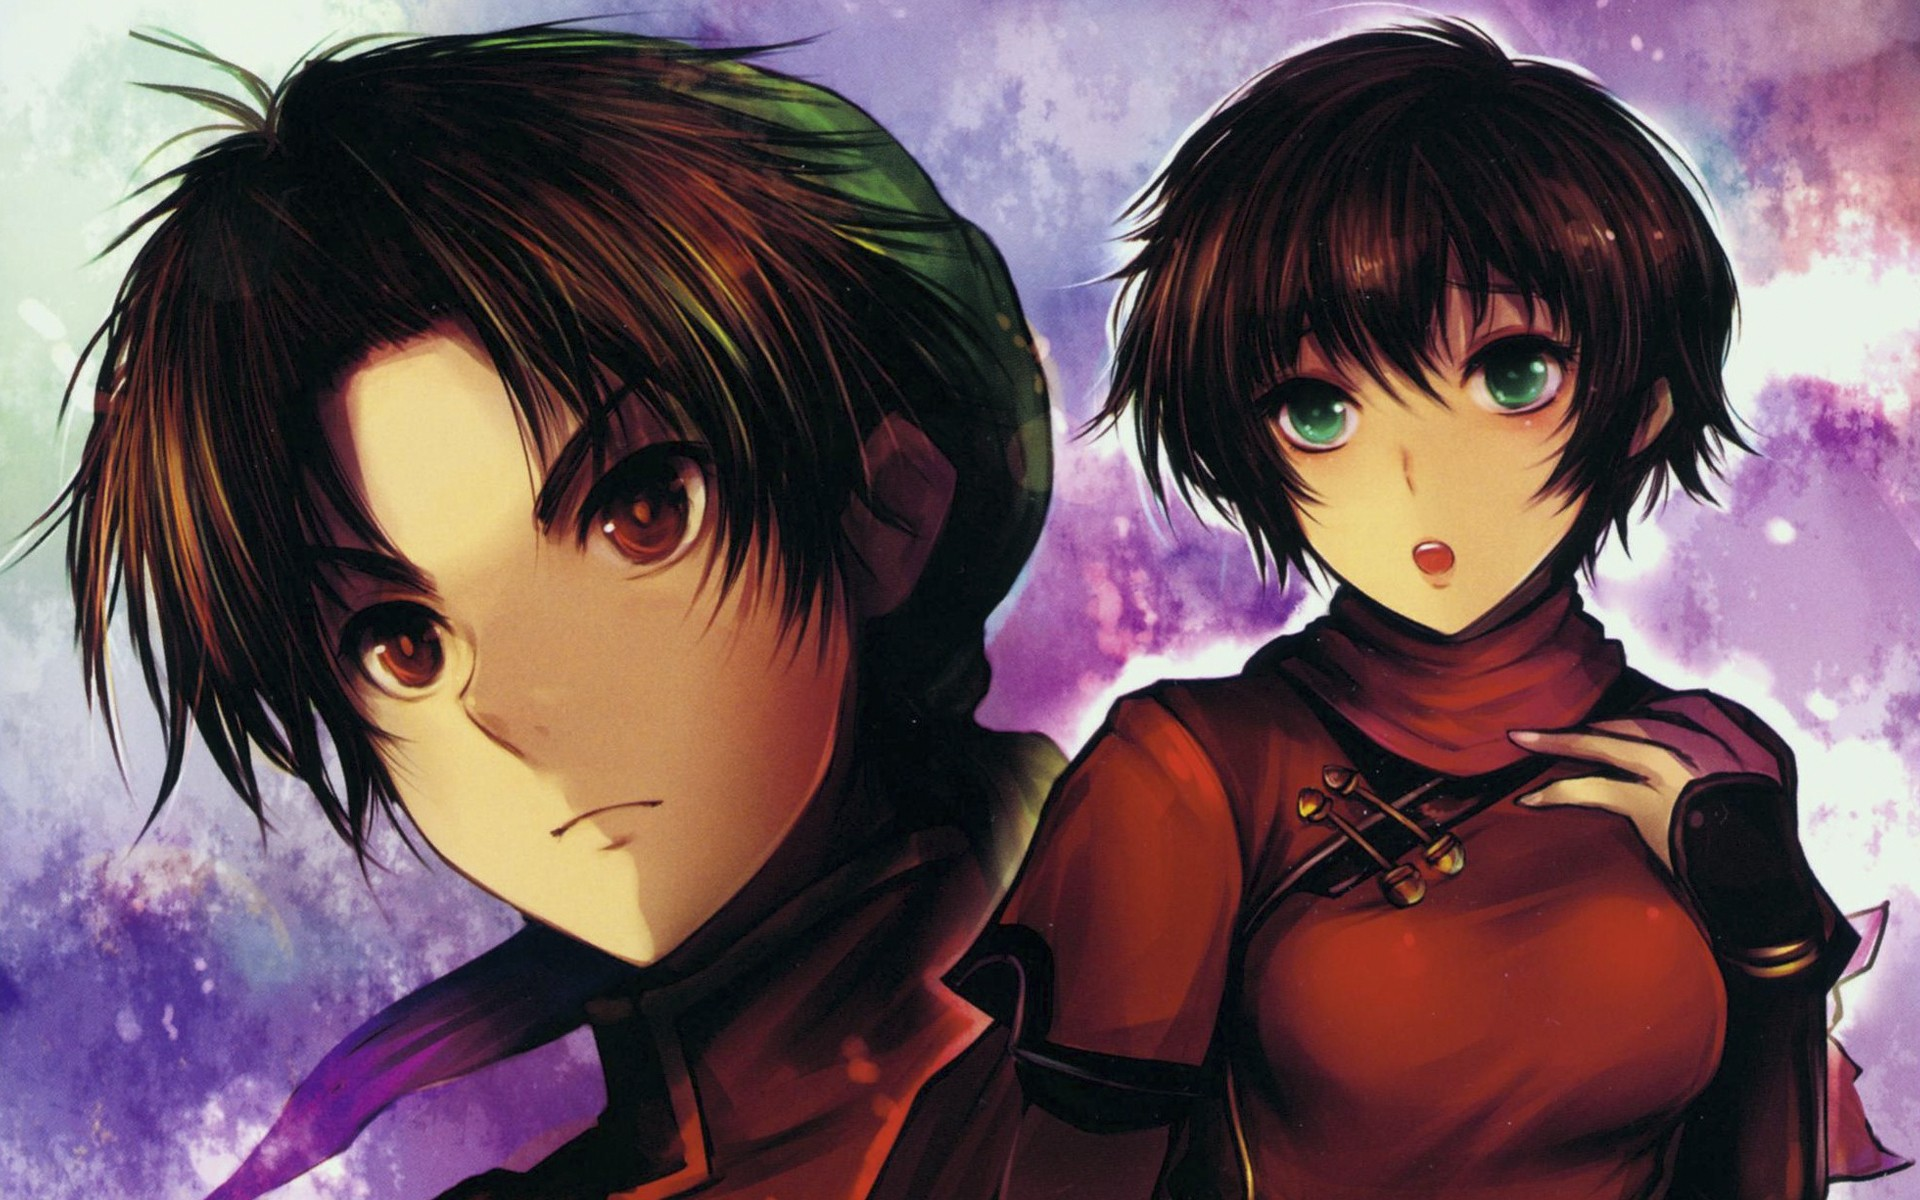 Green Eyes Short Hair Artwork Anime Boys Anime Girls Faces Akarasamana Wallpaper 1920x1200 205396 Wallpaperup